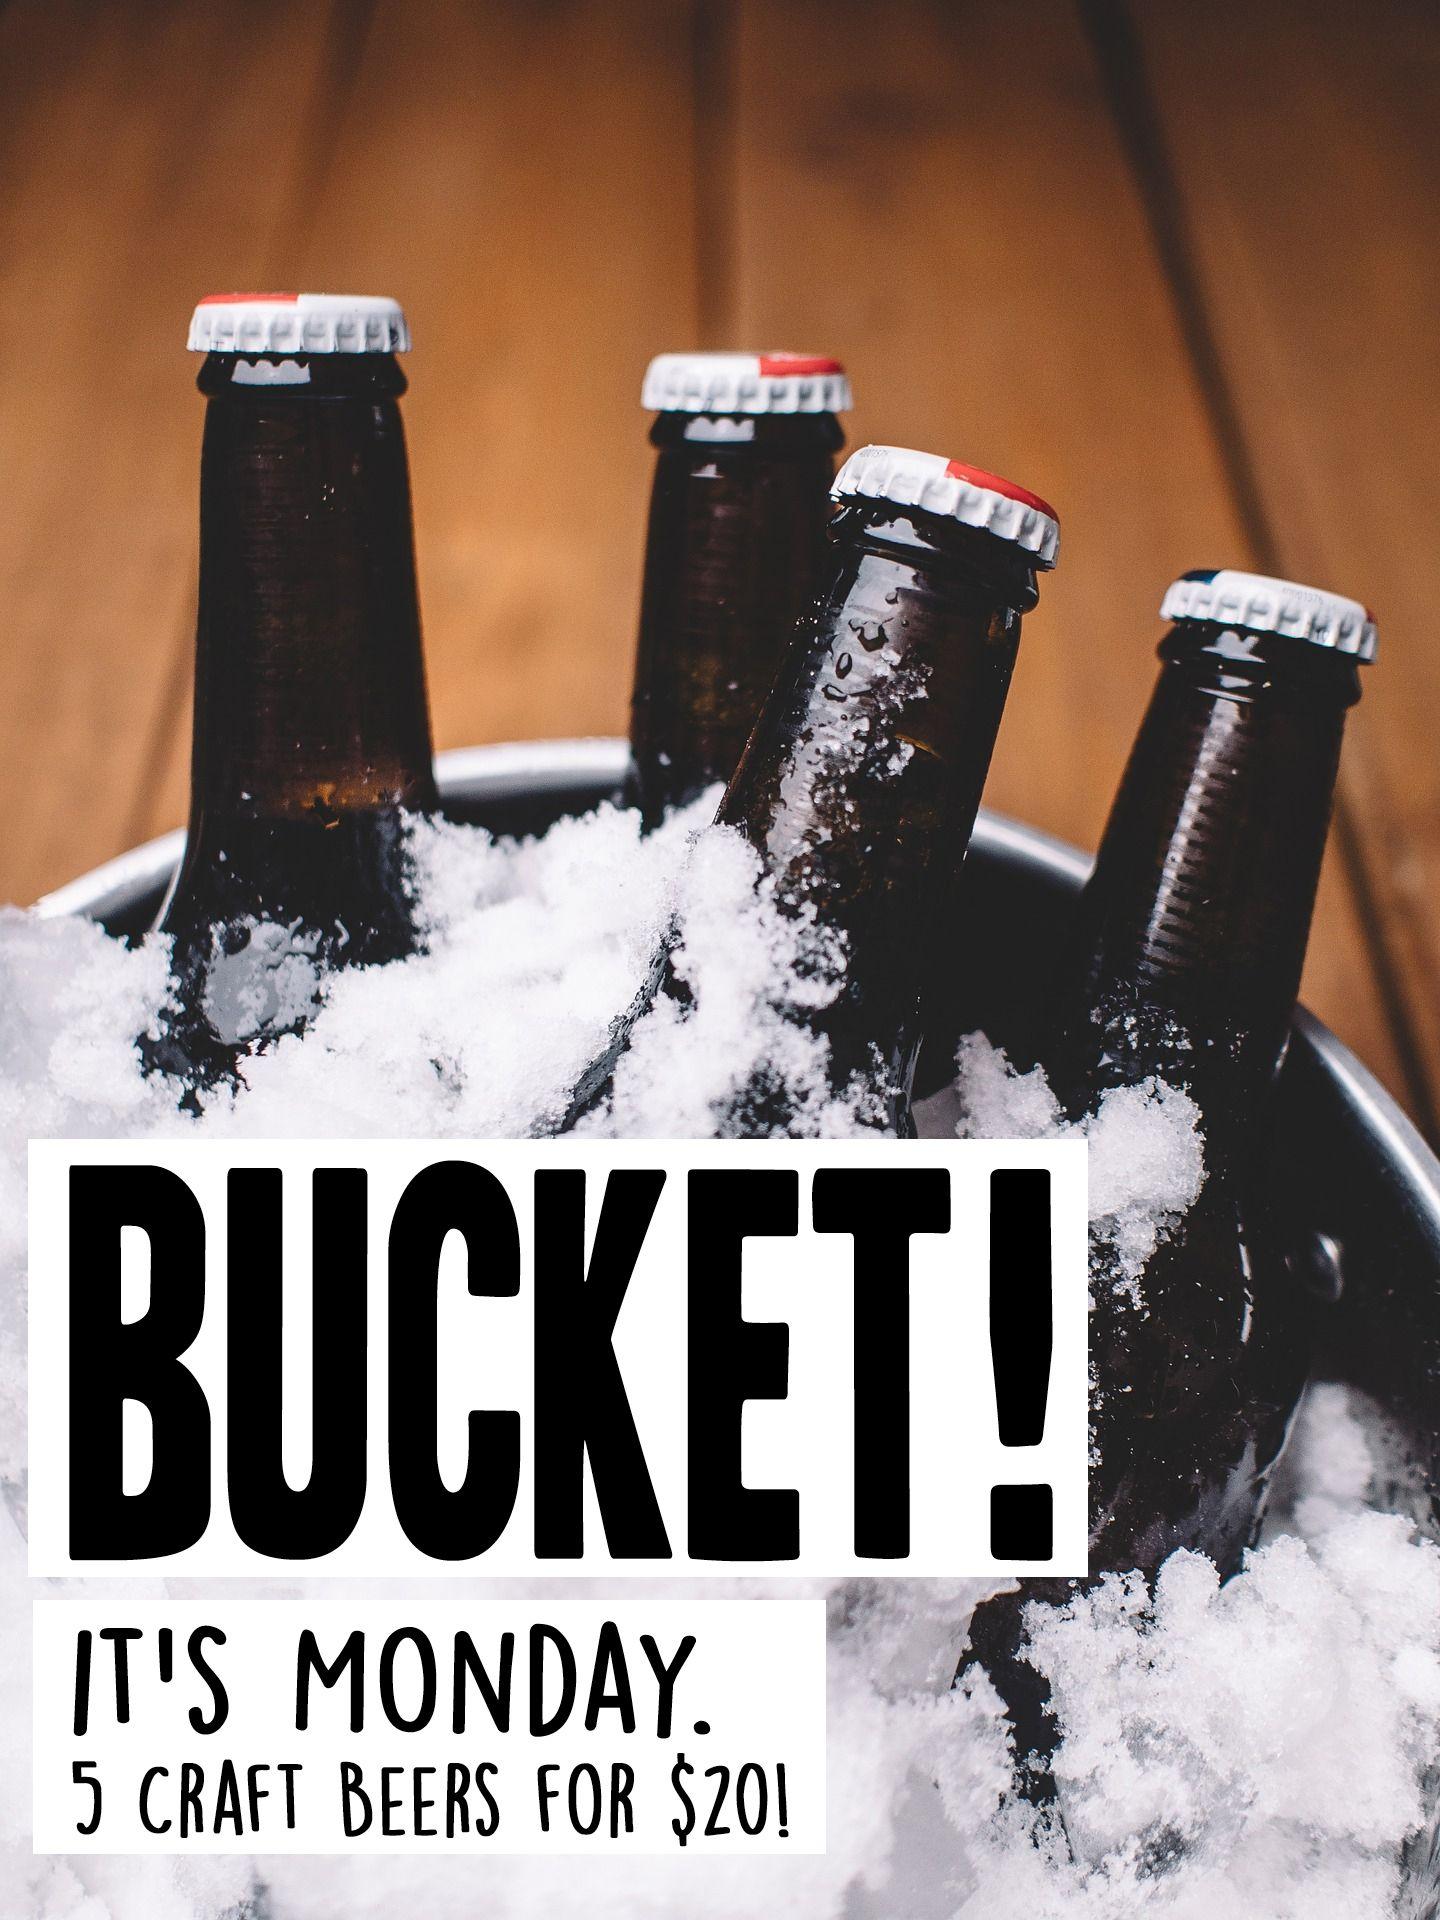 iklan l I ll pukul ukkydevcvtthbtnfvbvvbbtBucket it s Monday Choose 5 craft beers